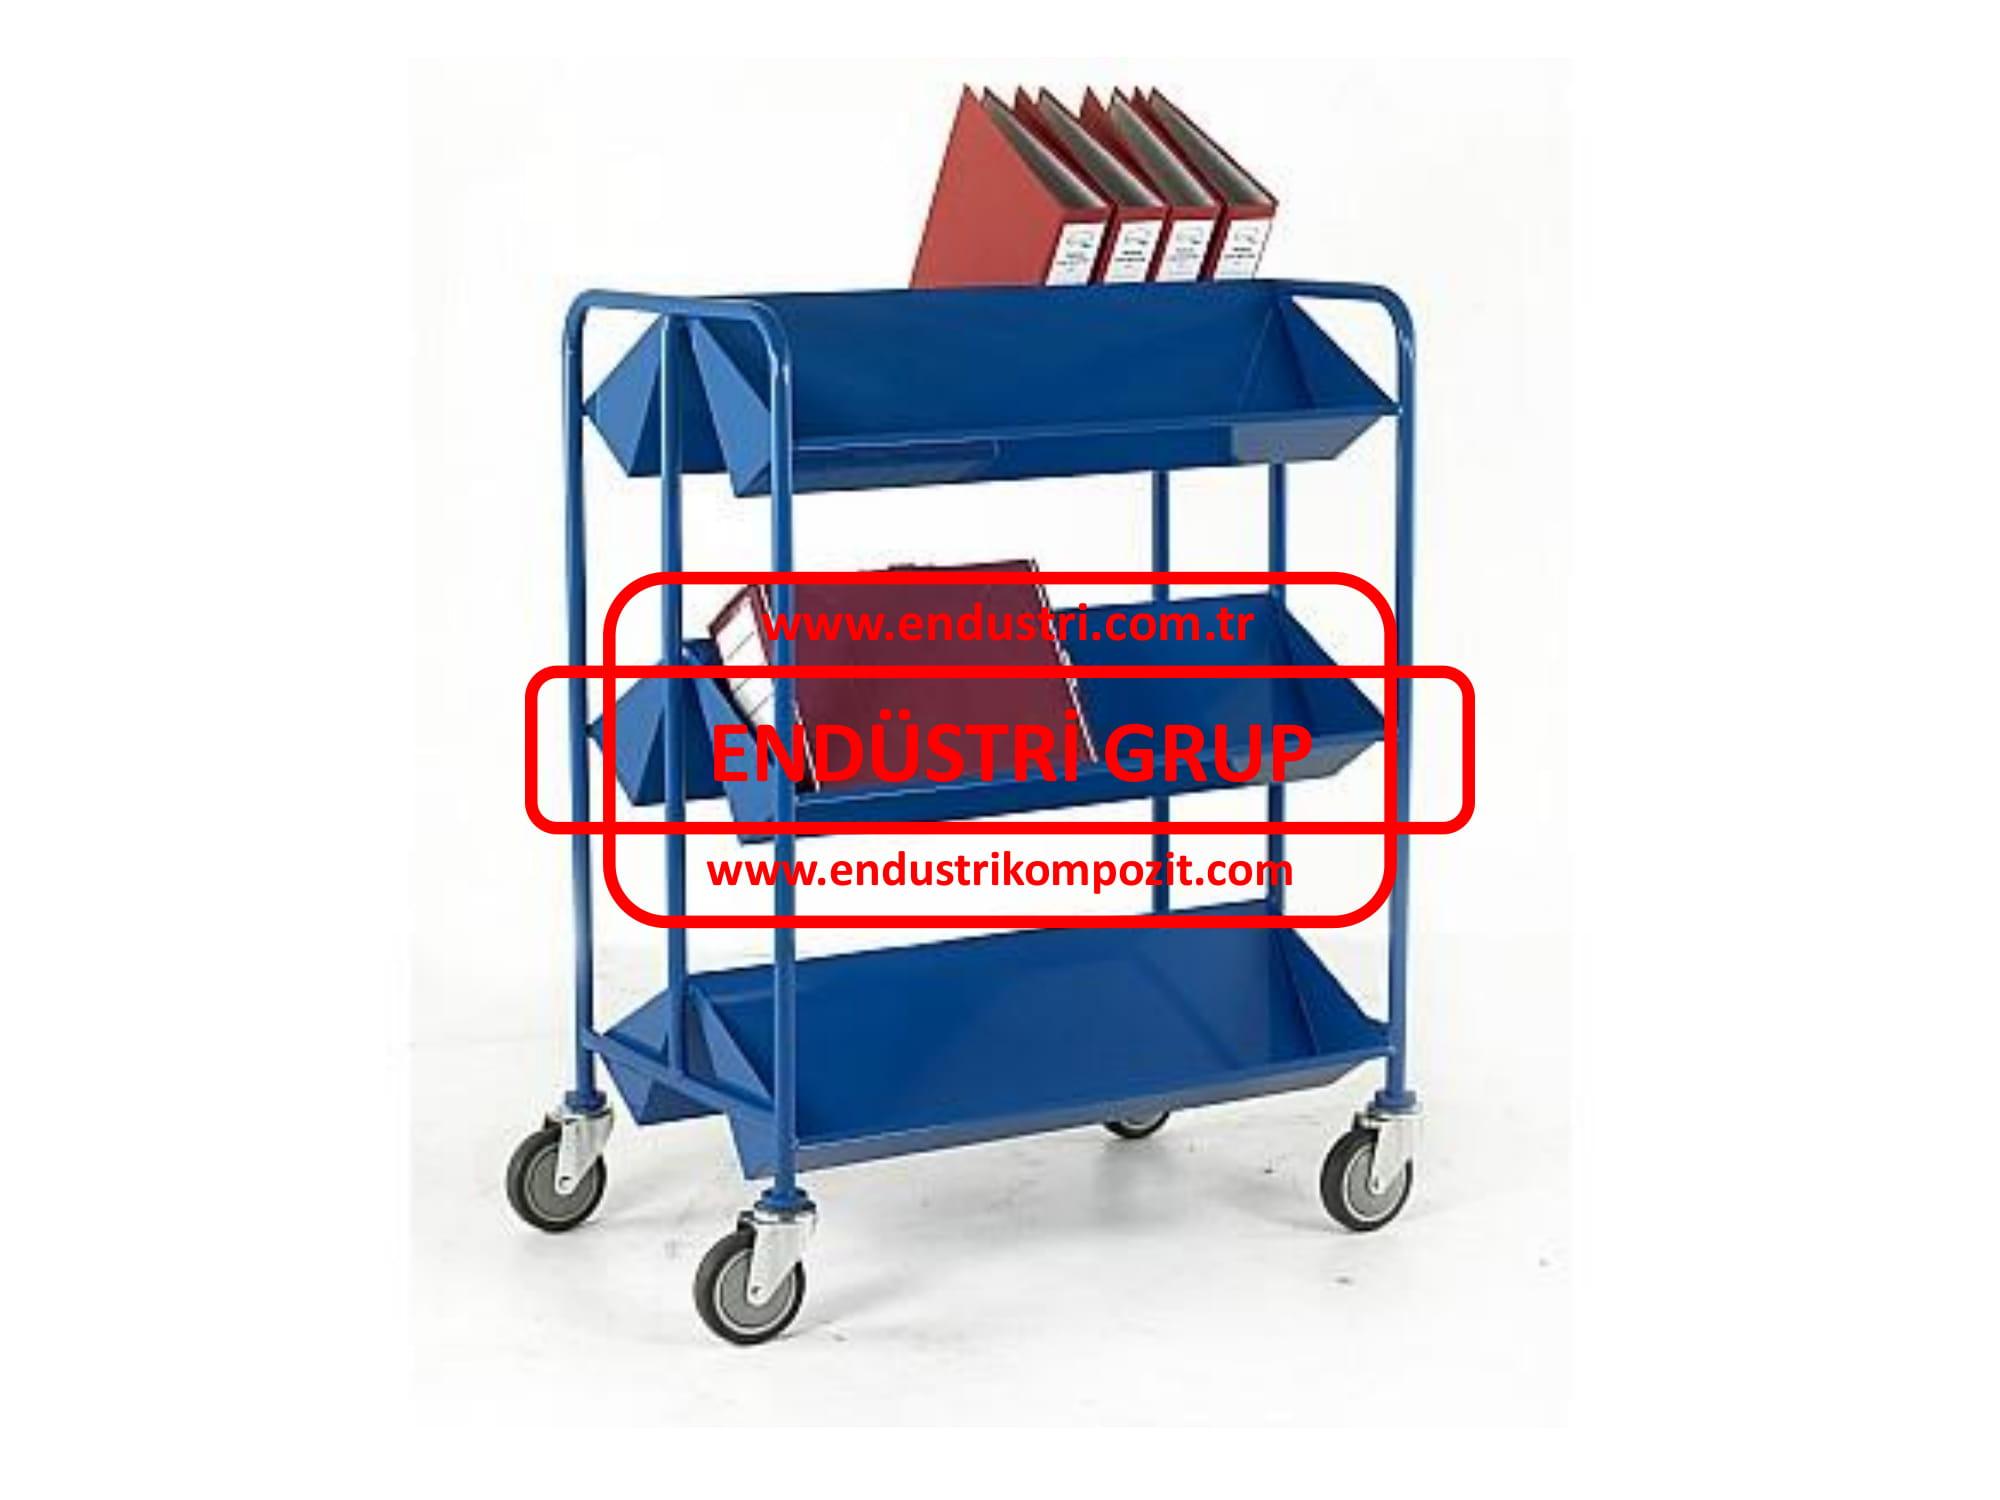 tekerlekli-kitap-dosya-evrak-aktarma-metal-tasima-arabasi-arabalari-paleti-sehpasi-fiyati